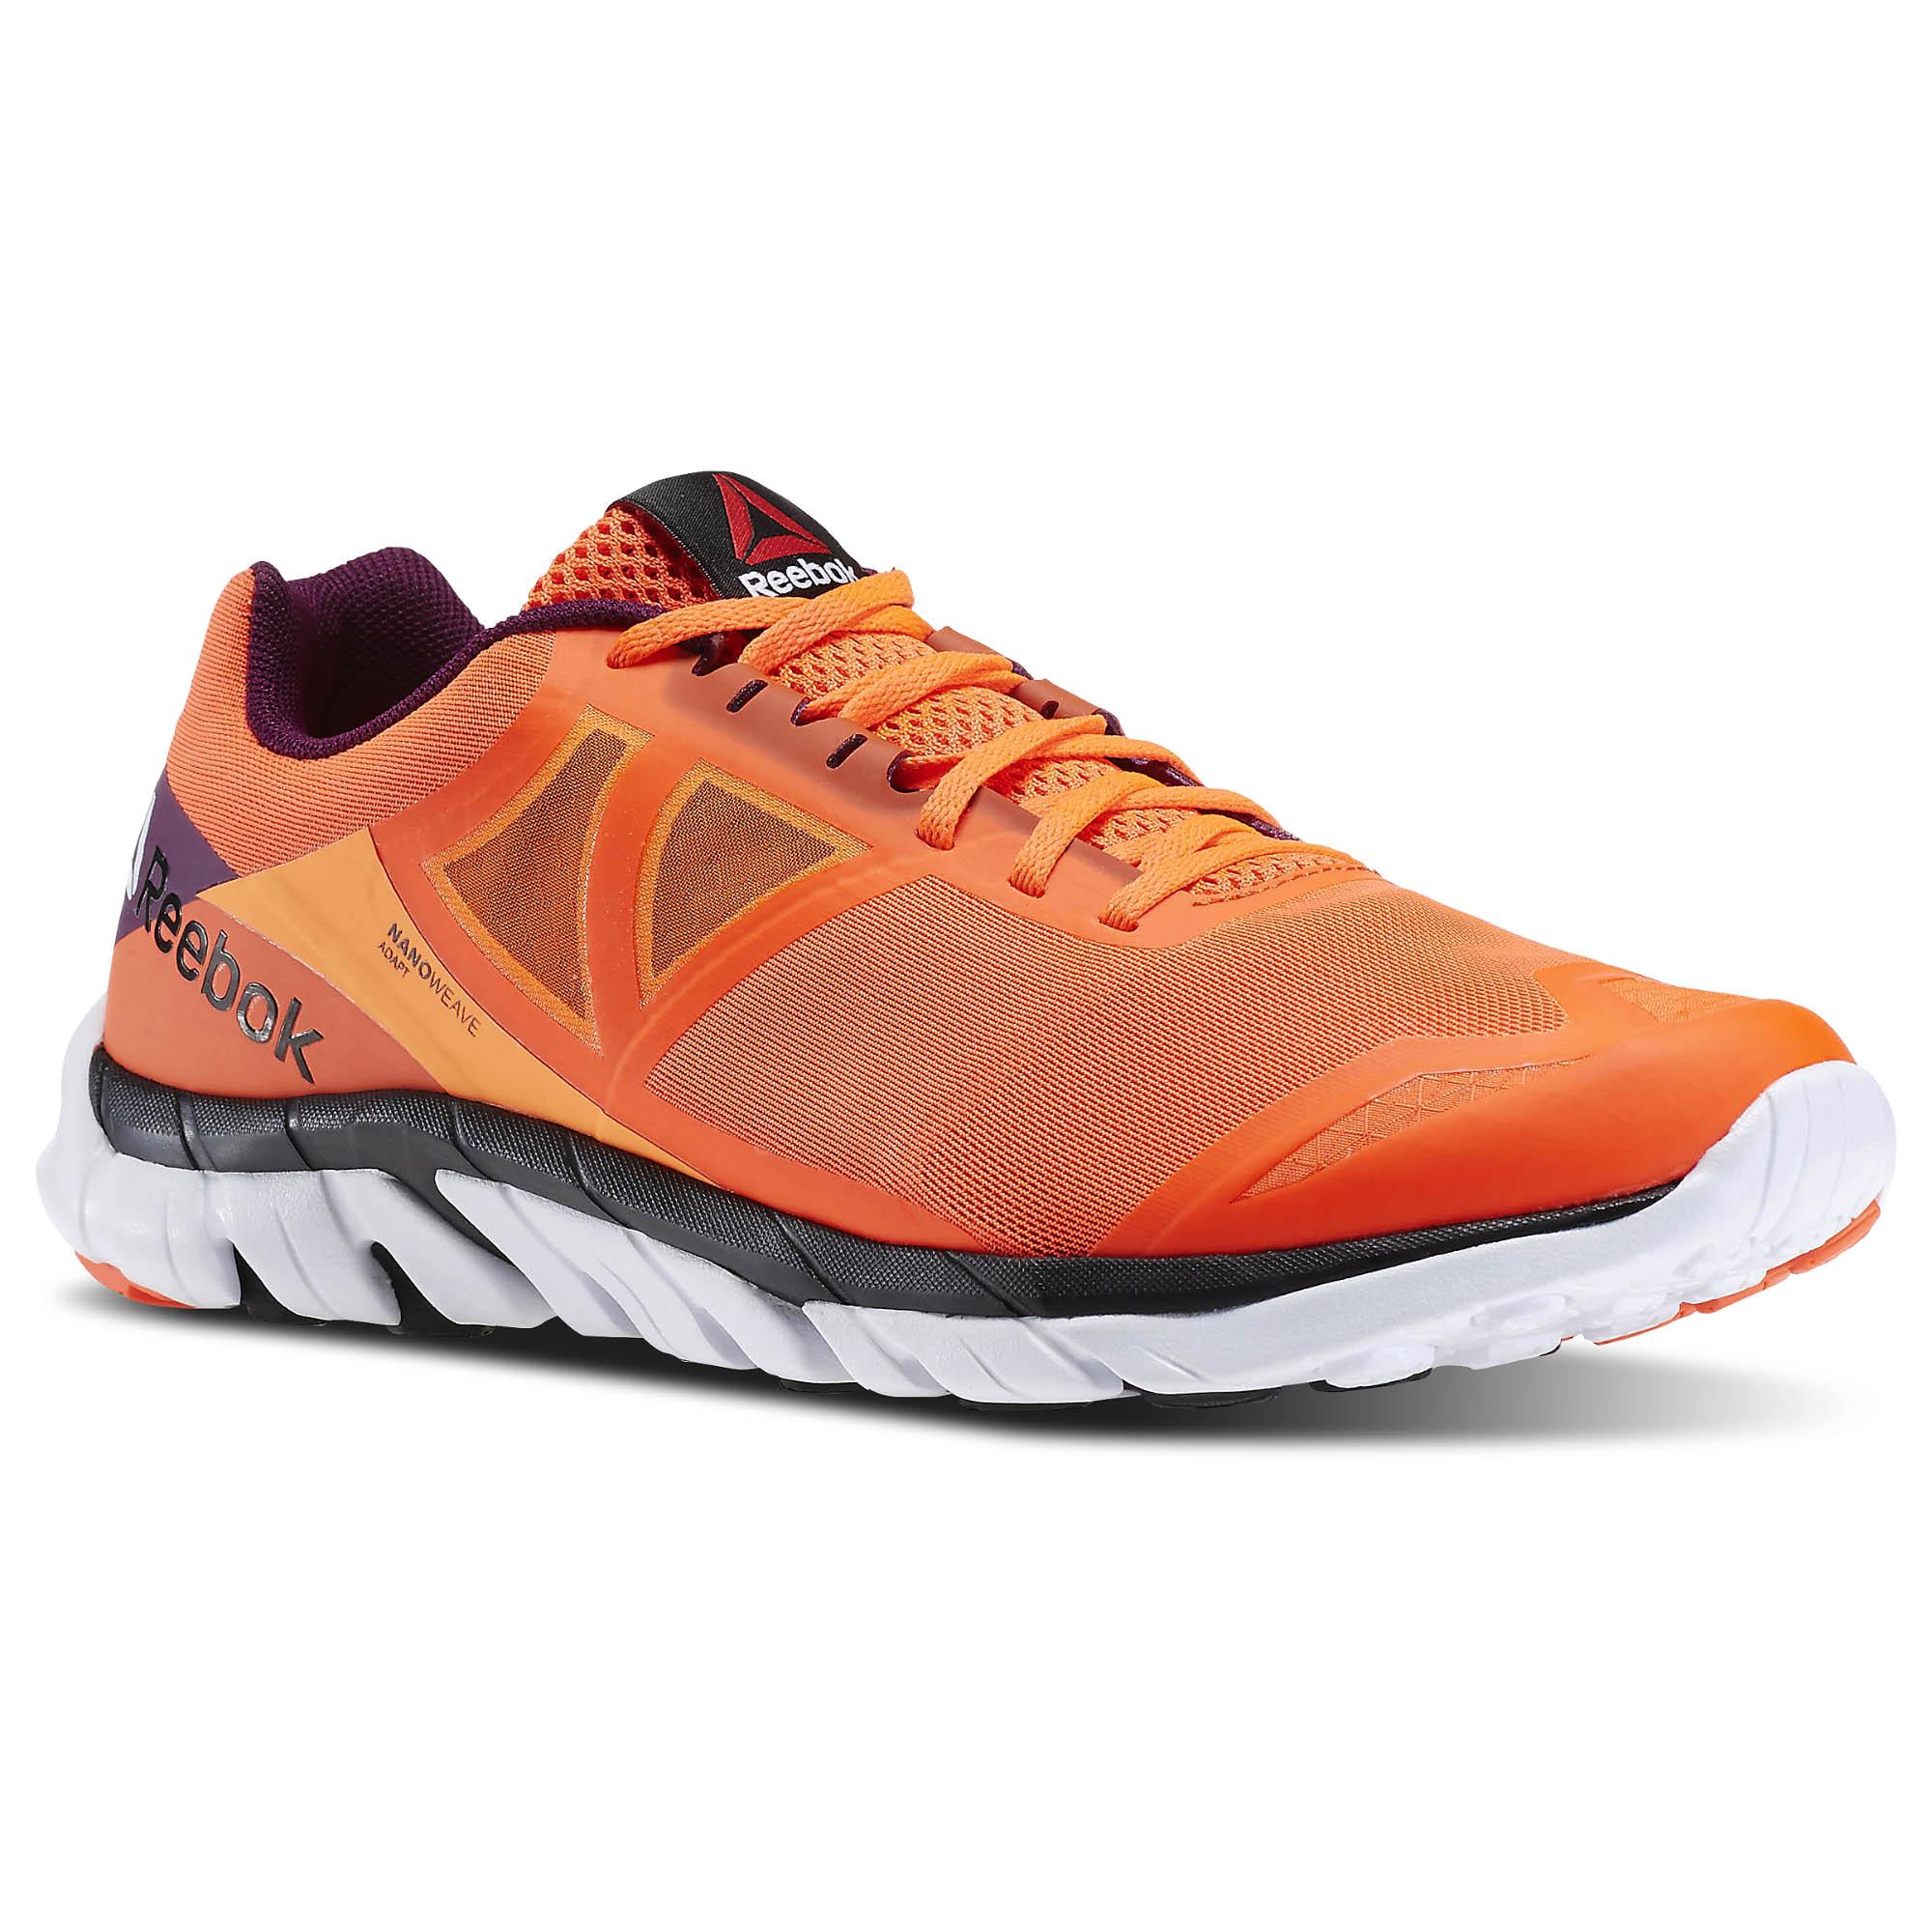 564e416f6360 Reebok Running shoes Zstrike run ladies red - Internet-Sport Casuals